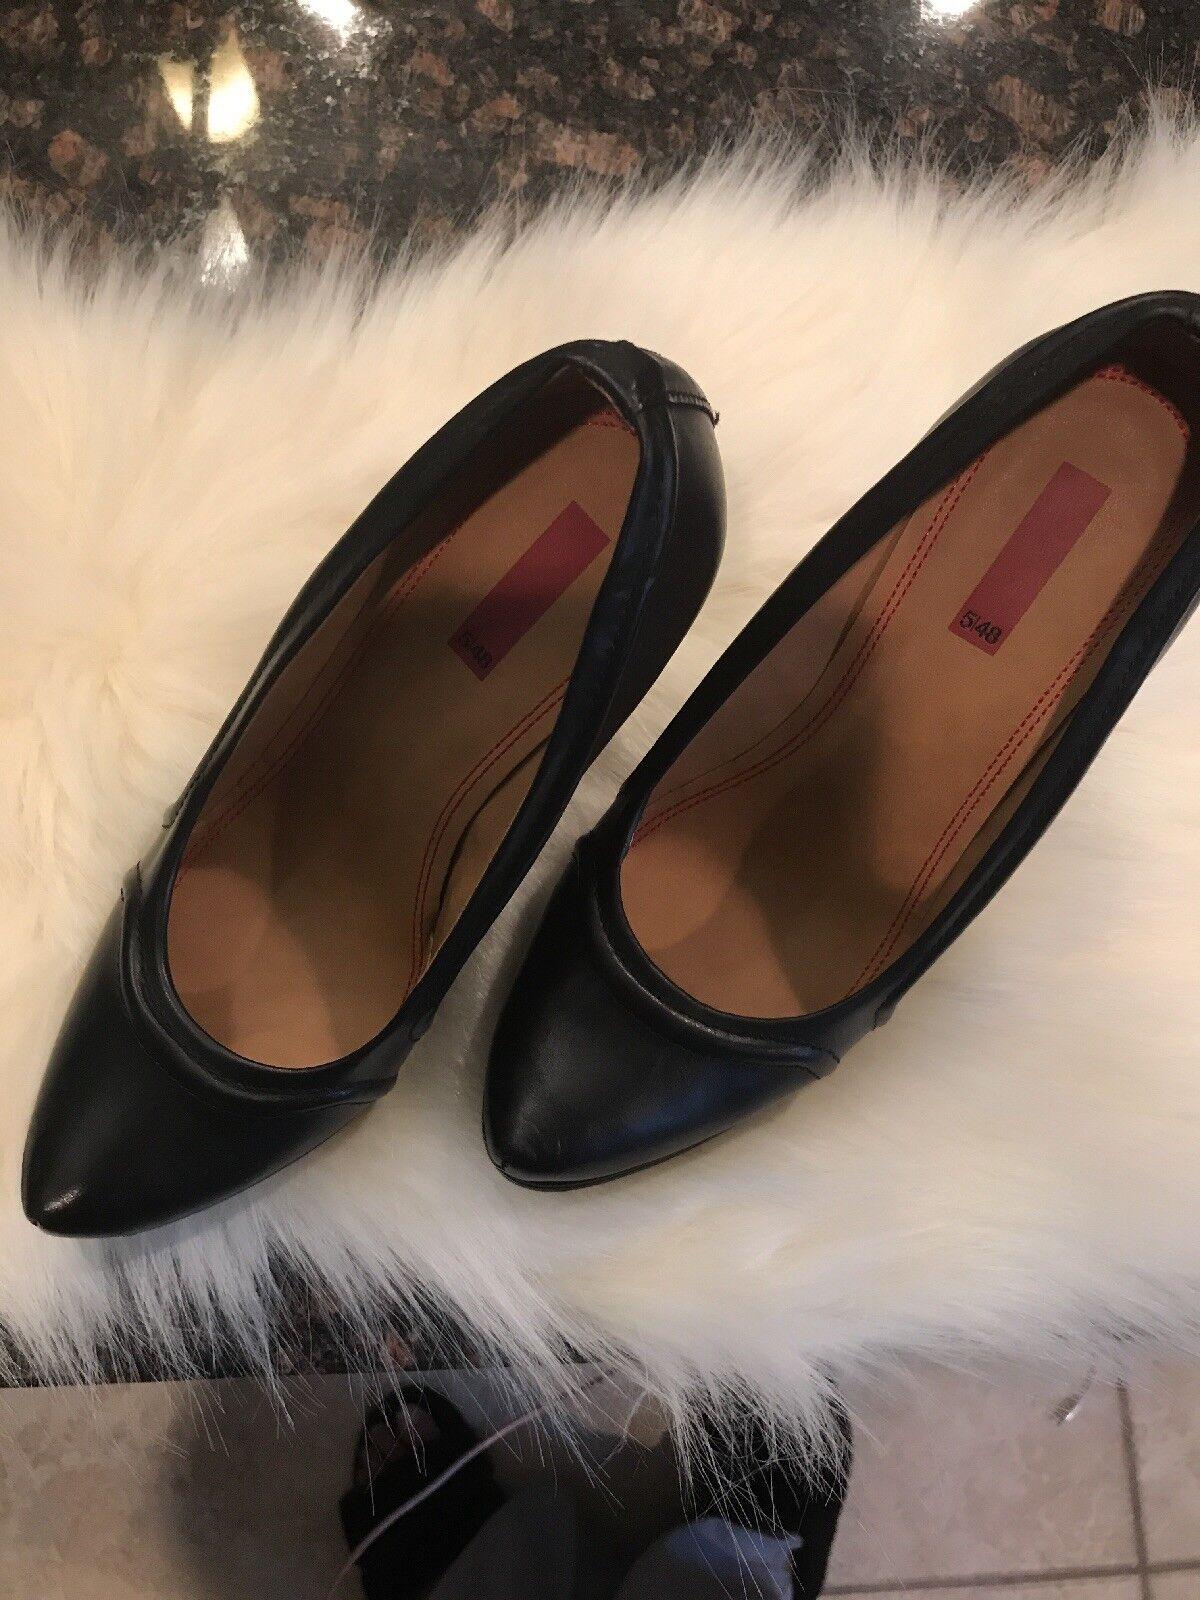 Saks Fifth Avenue 5 48 Black Leather Wedge Heel Pumps Sz 39.5  150